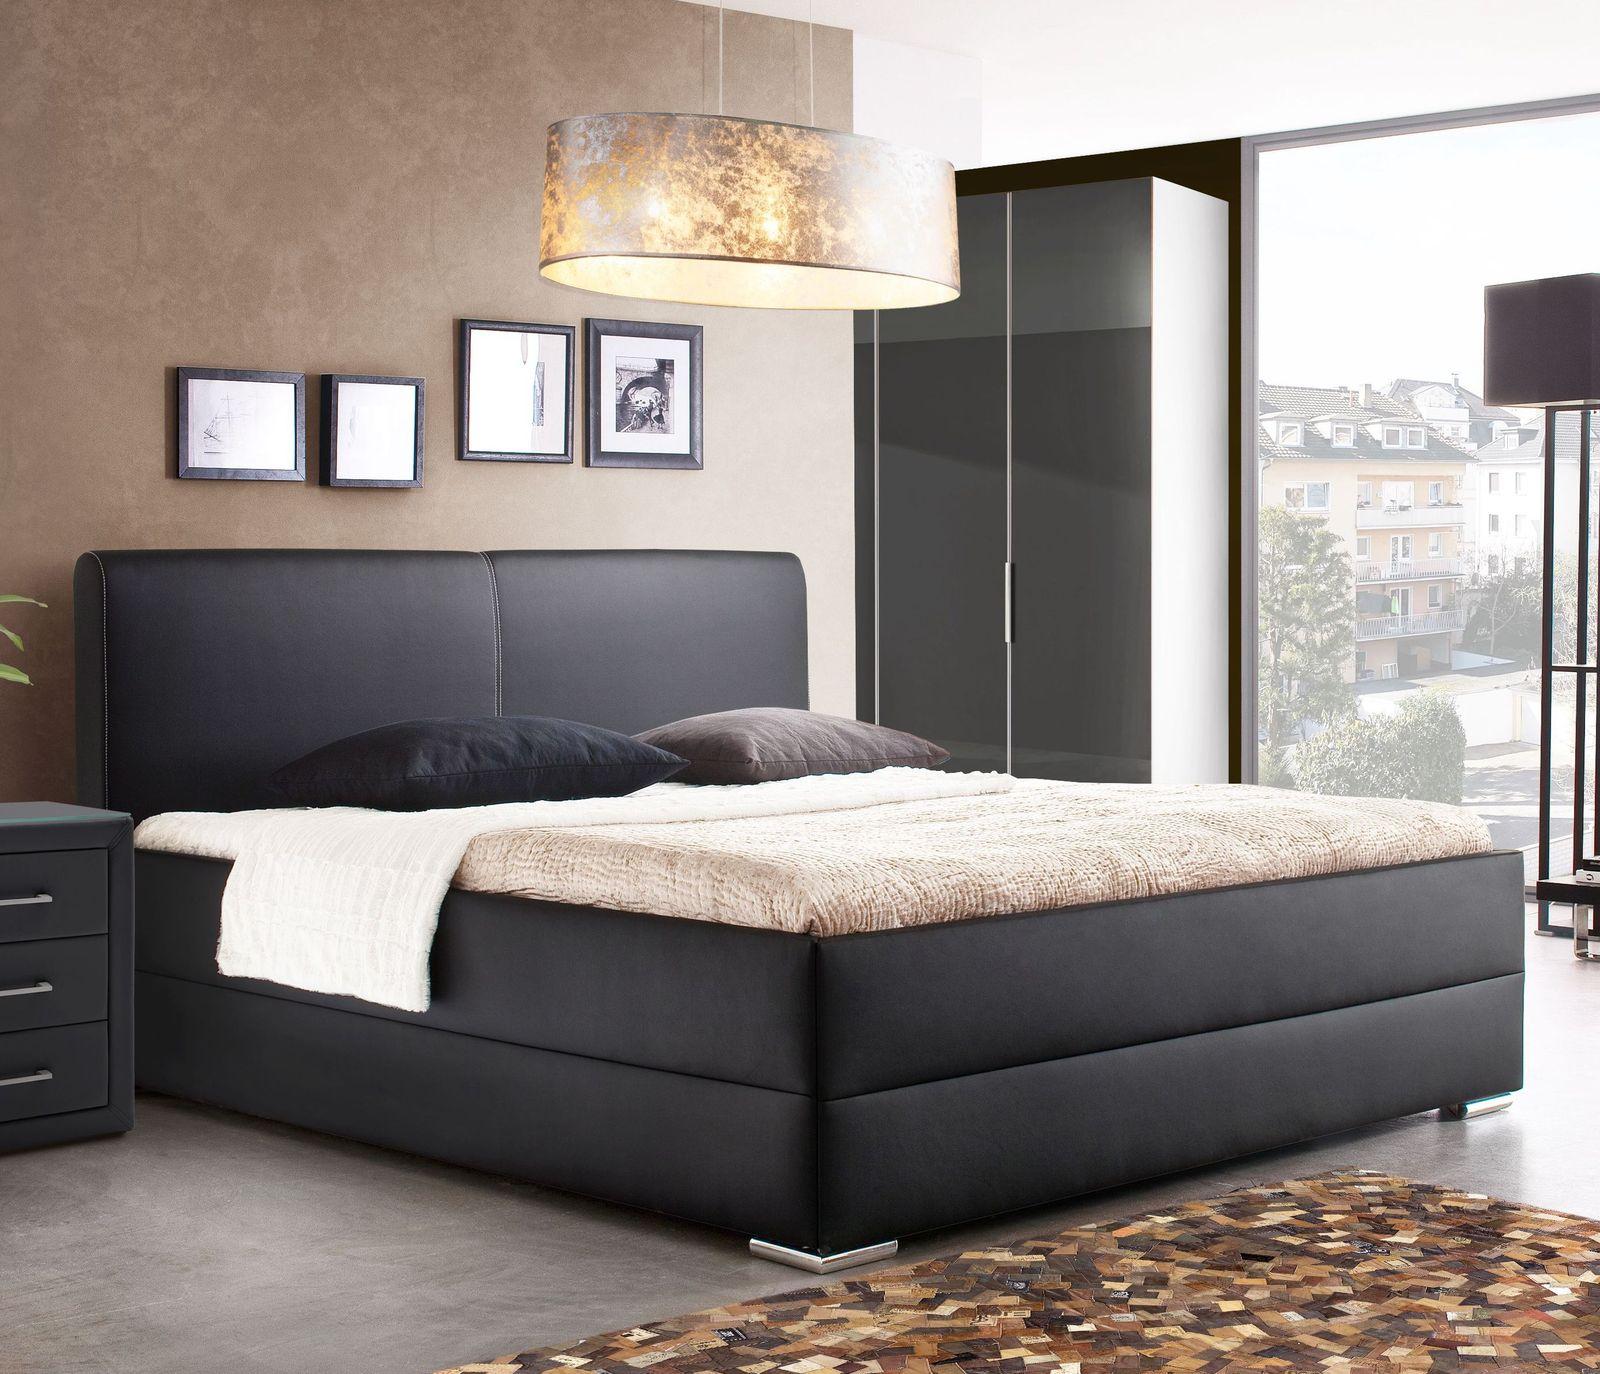 hohes polsterbett in boxspringoptik mit kunstleder nulato. Black Bedroom Furniture Sets. Home Design Ideas